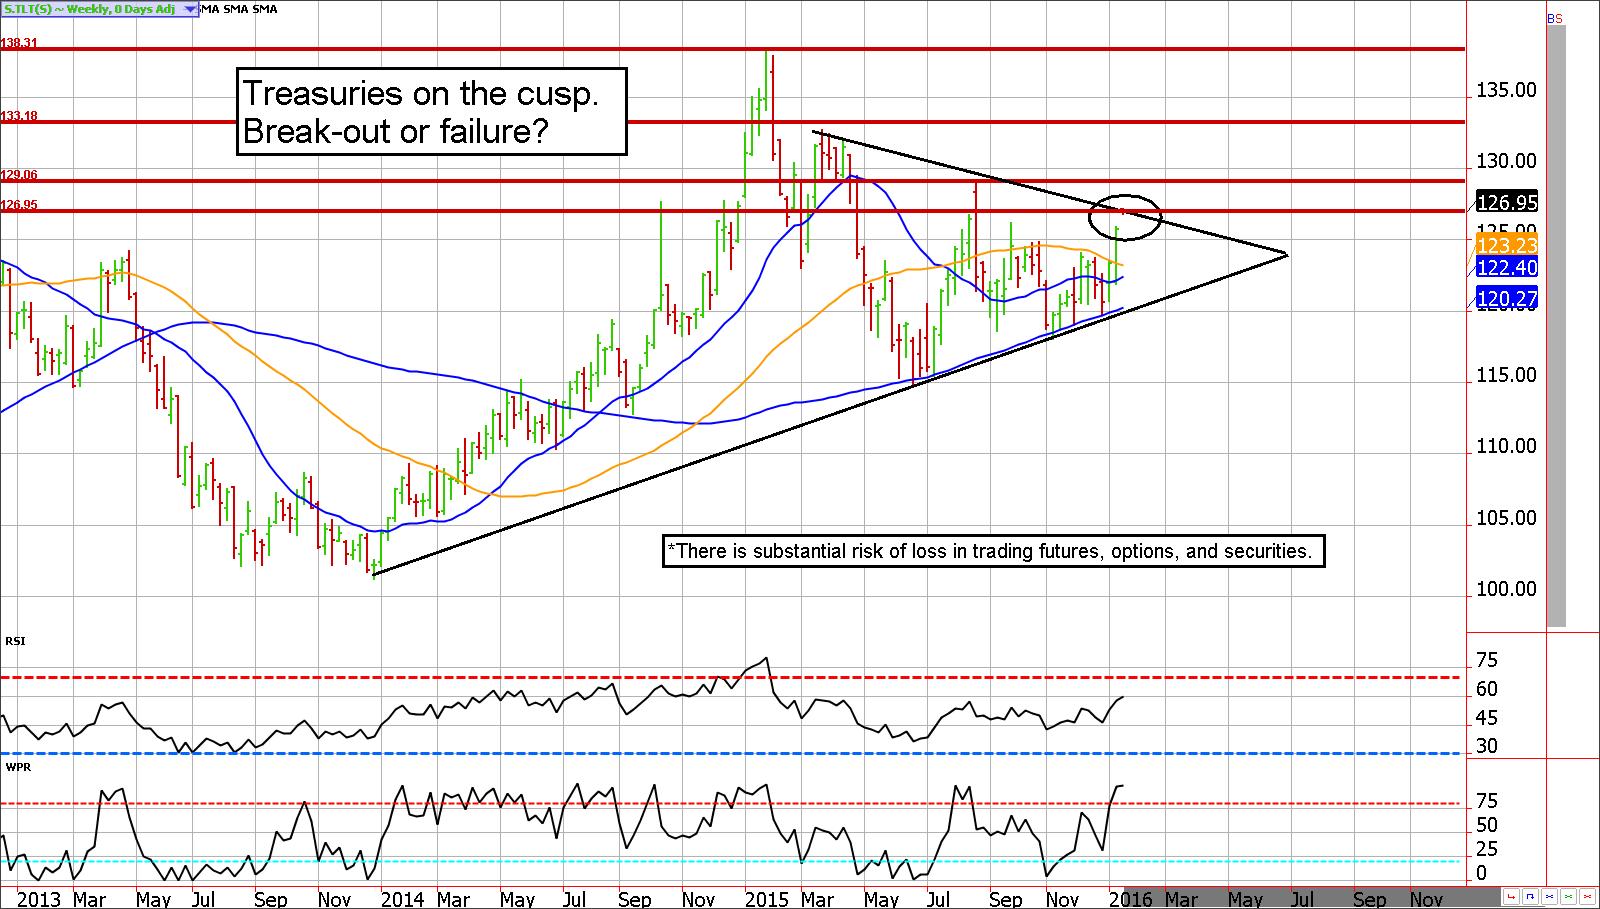 trading treasury futures options